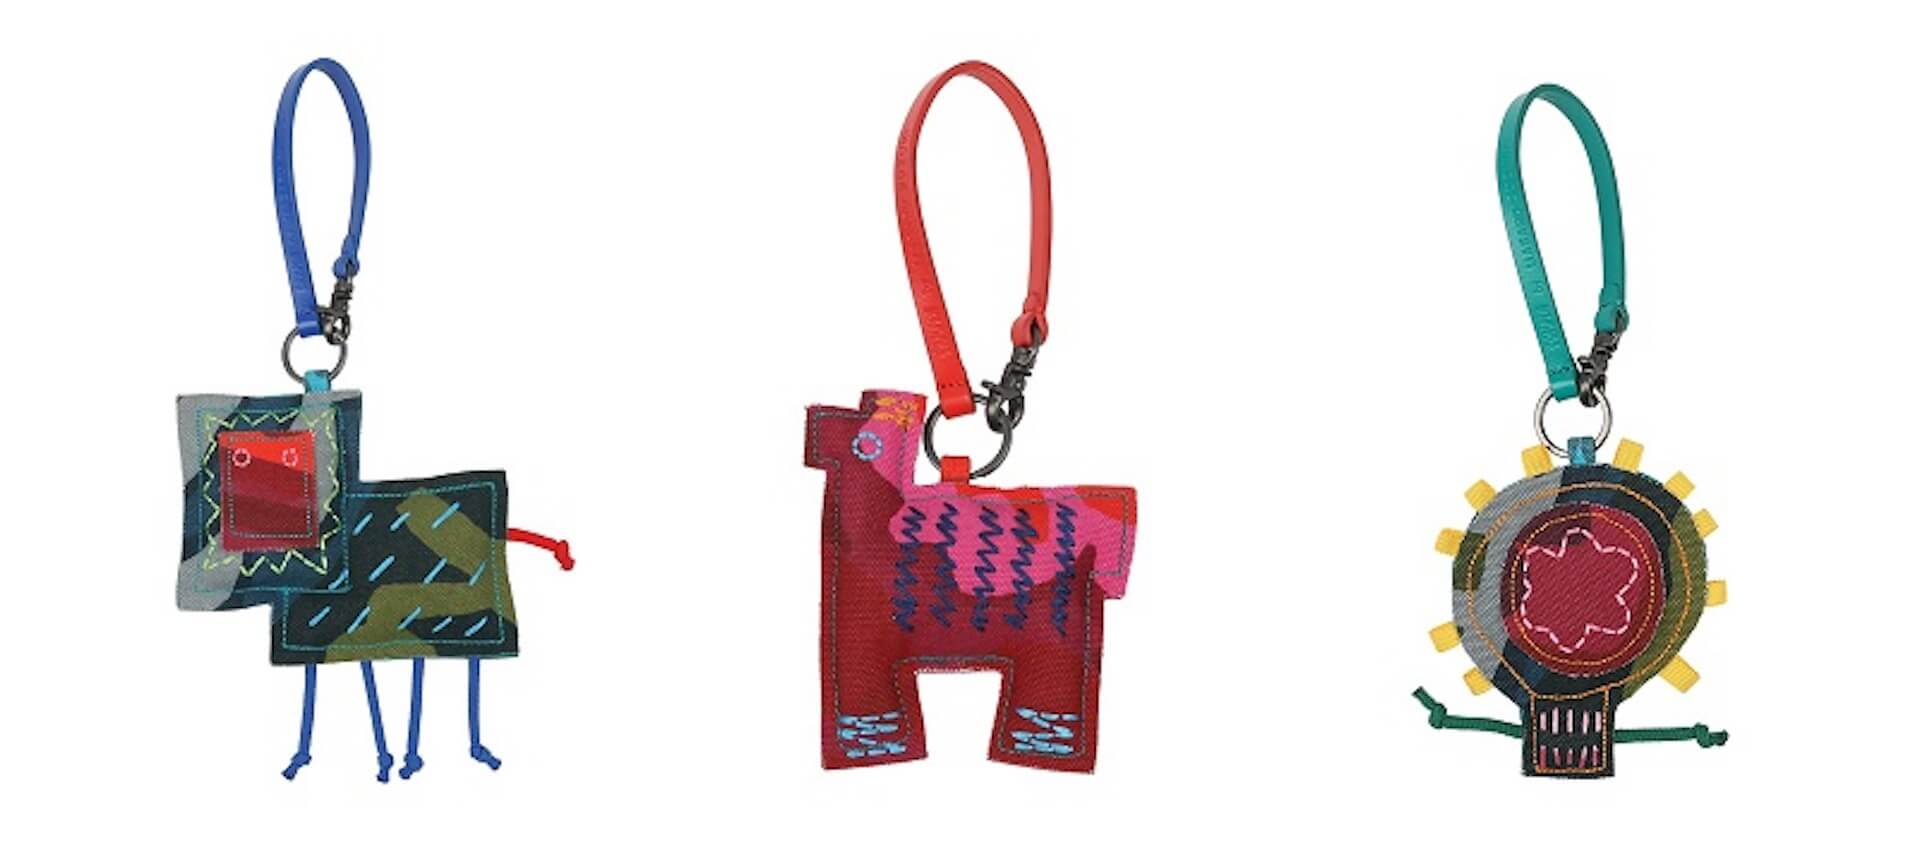 CAMPERと鈴木マサルが3度目のコラボコレクションを発表!RUNNERをベースにしたシューズや新作バッグなどが登場 fashion210118_camper_suzukimasaru_8